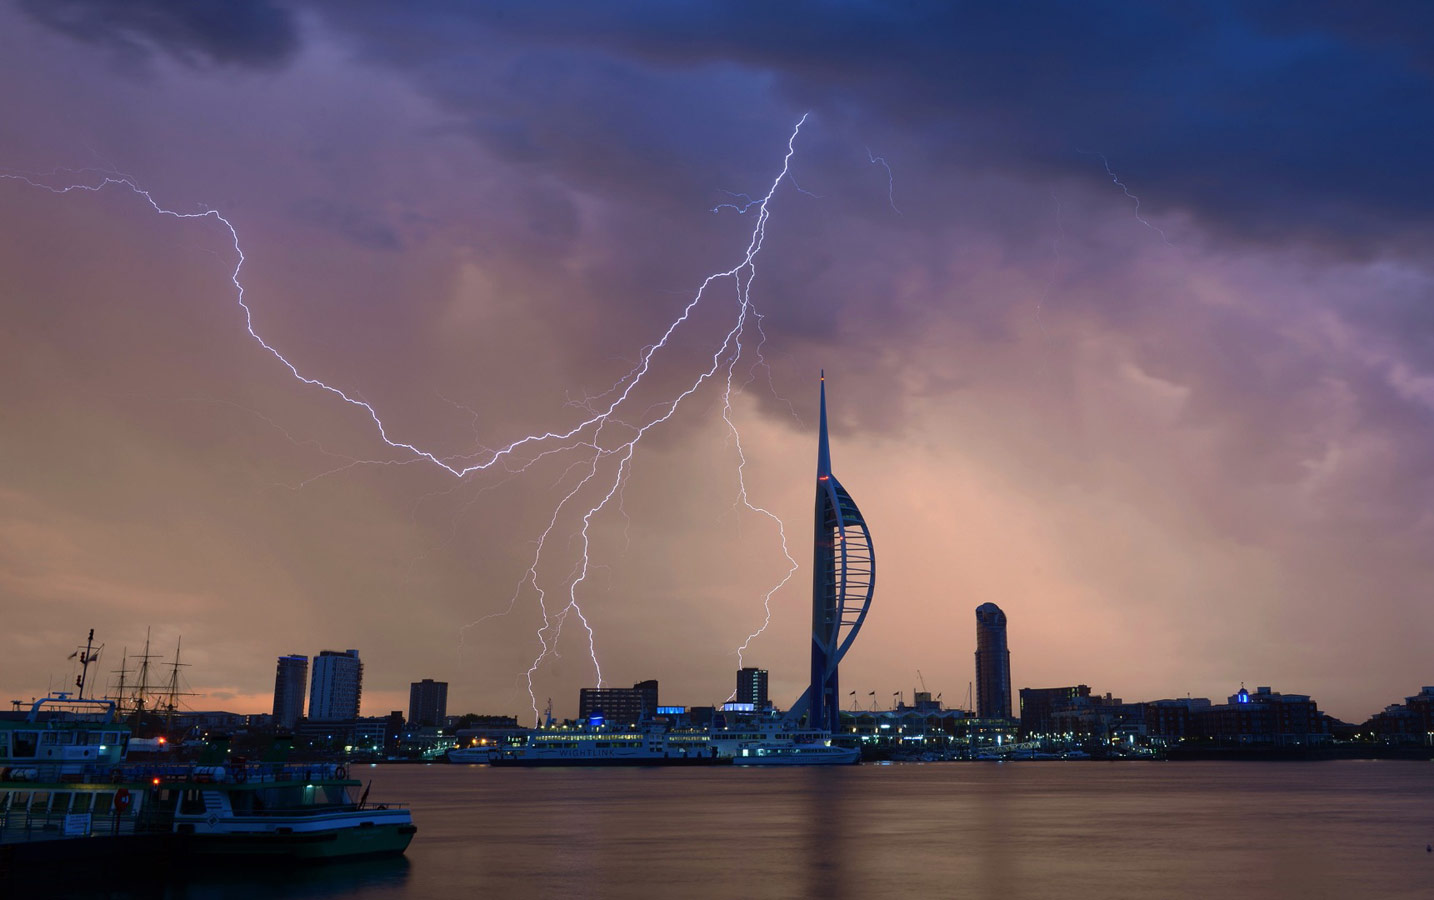 Пол Джейкобс / Paul Jacobs, Фотоконкурс RMetS / RPS Weather